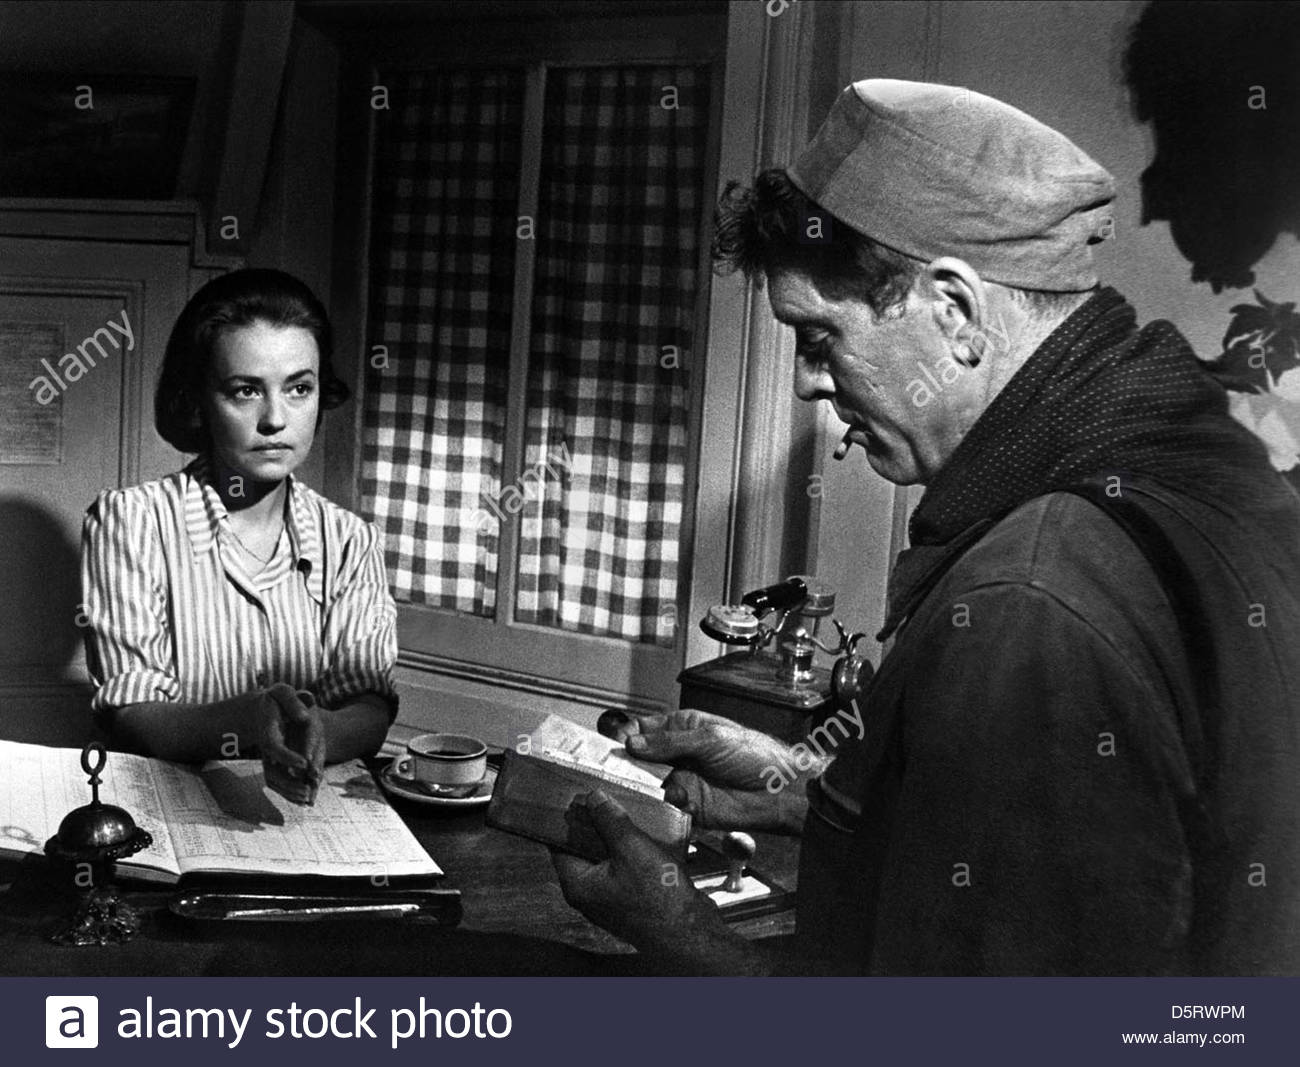 jeanne moreau amp burt lancaster the train 1964 stock photo